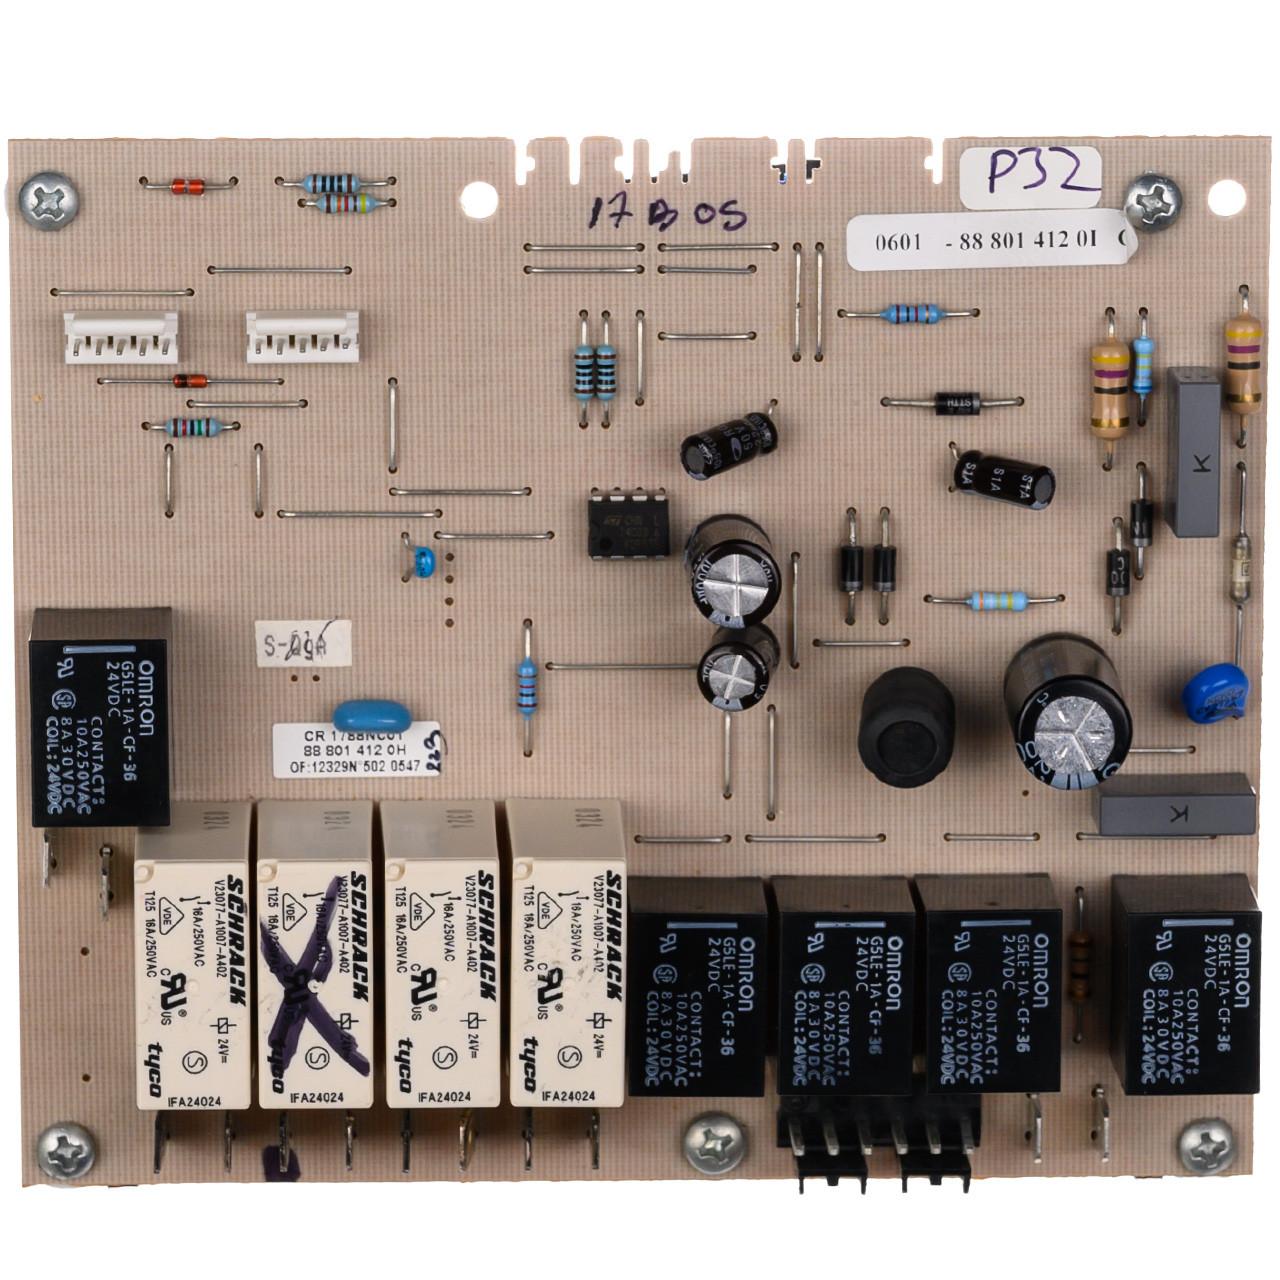 00497224 Thermador/Bosch Oven Control Board Repair